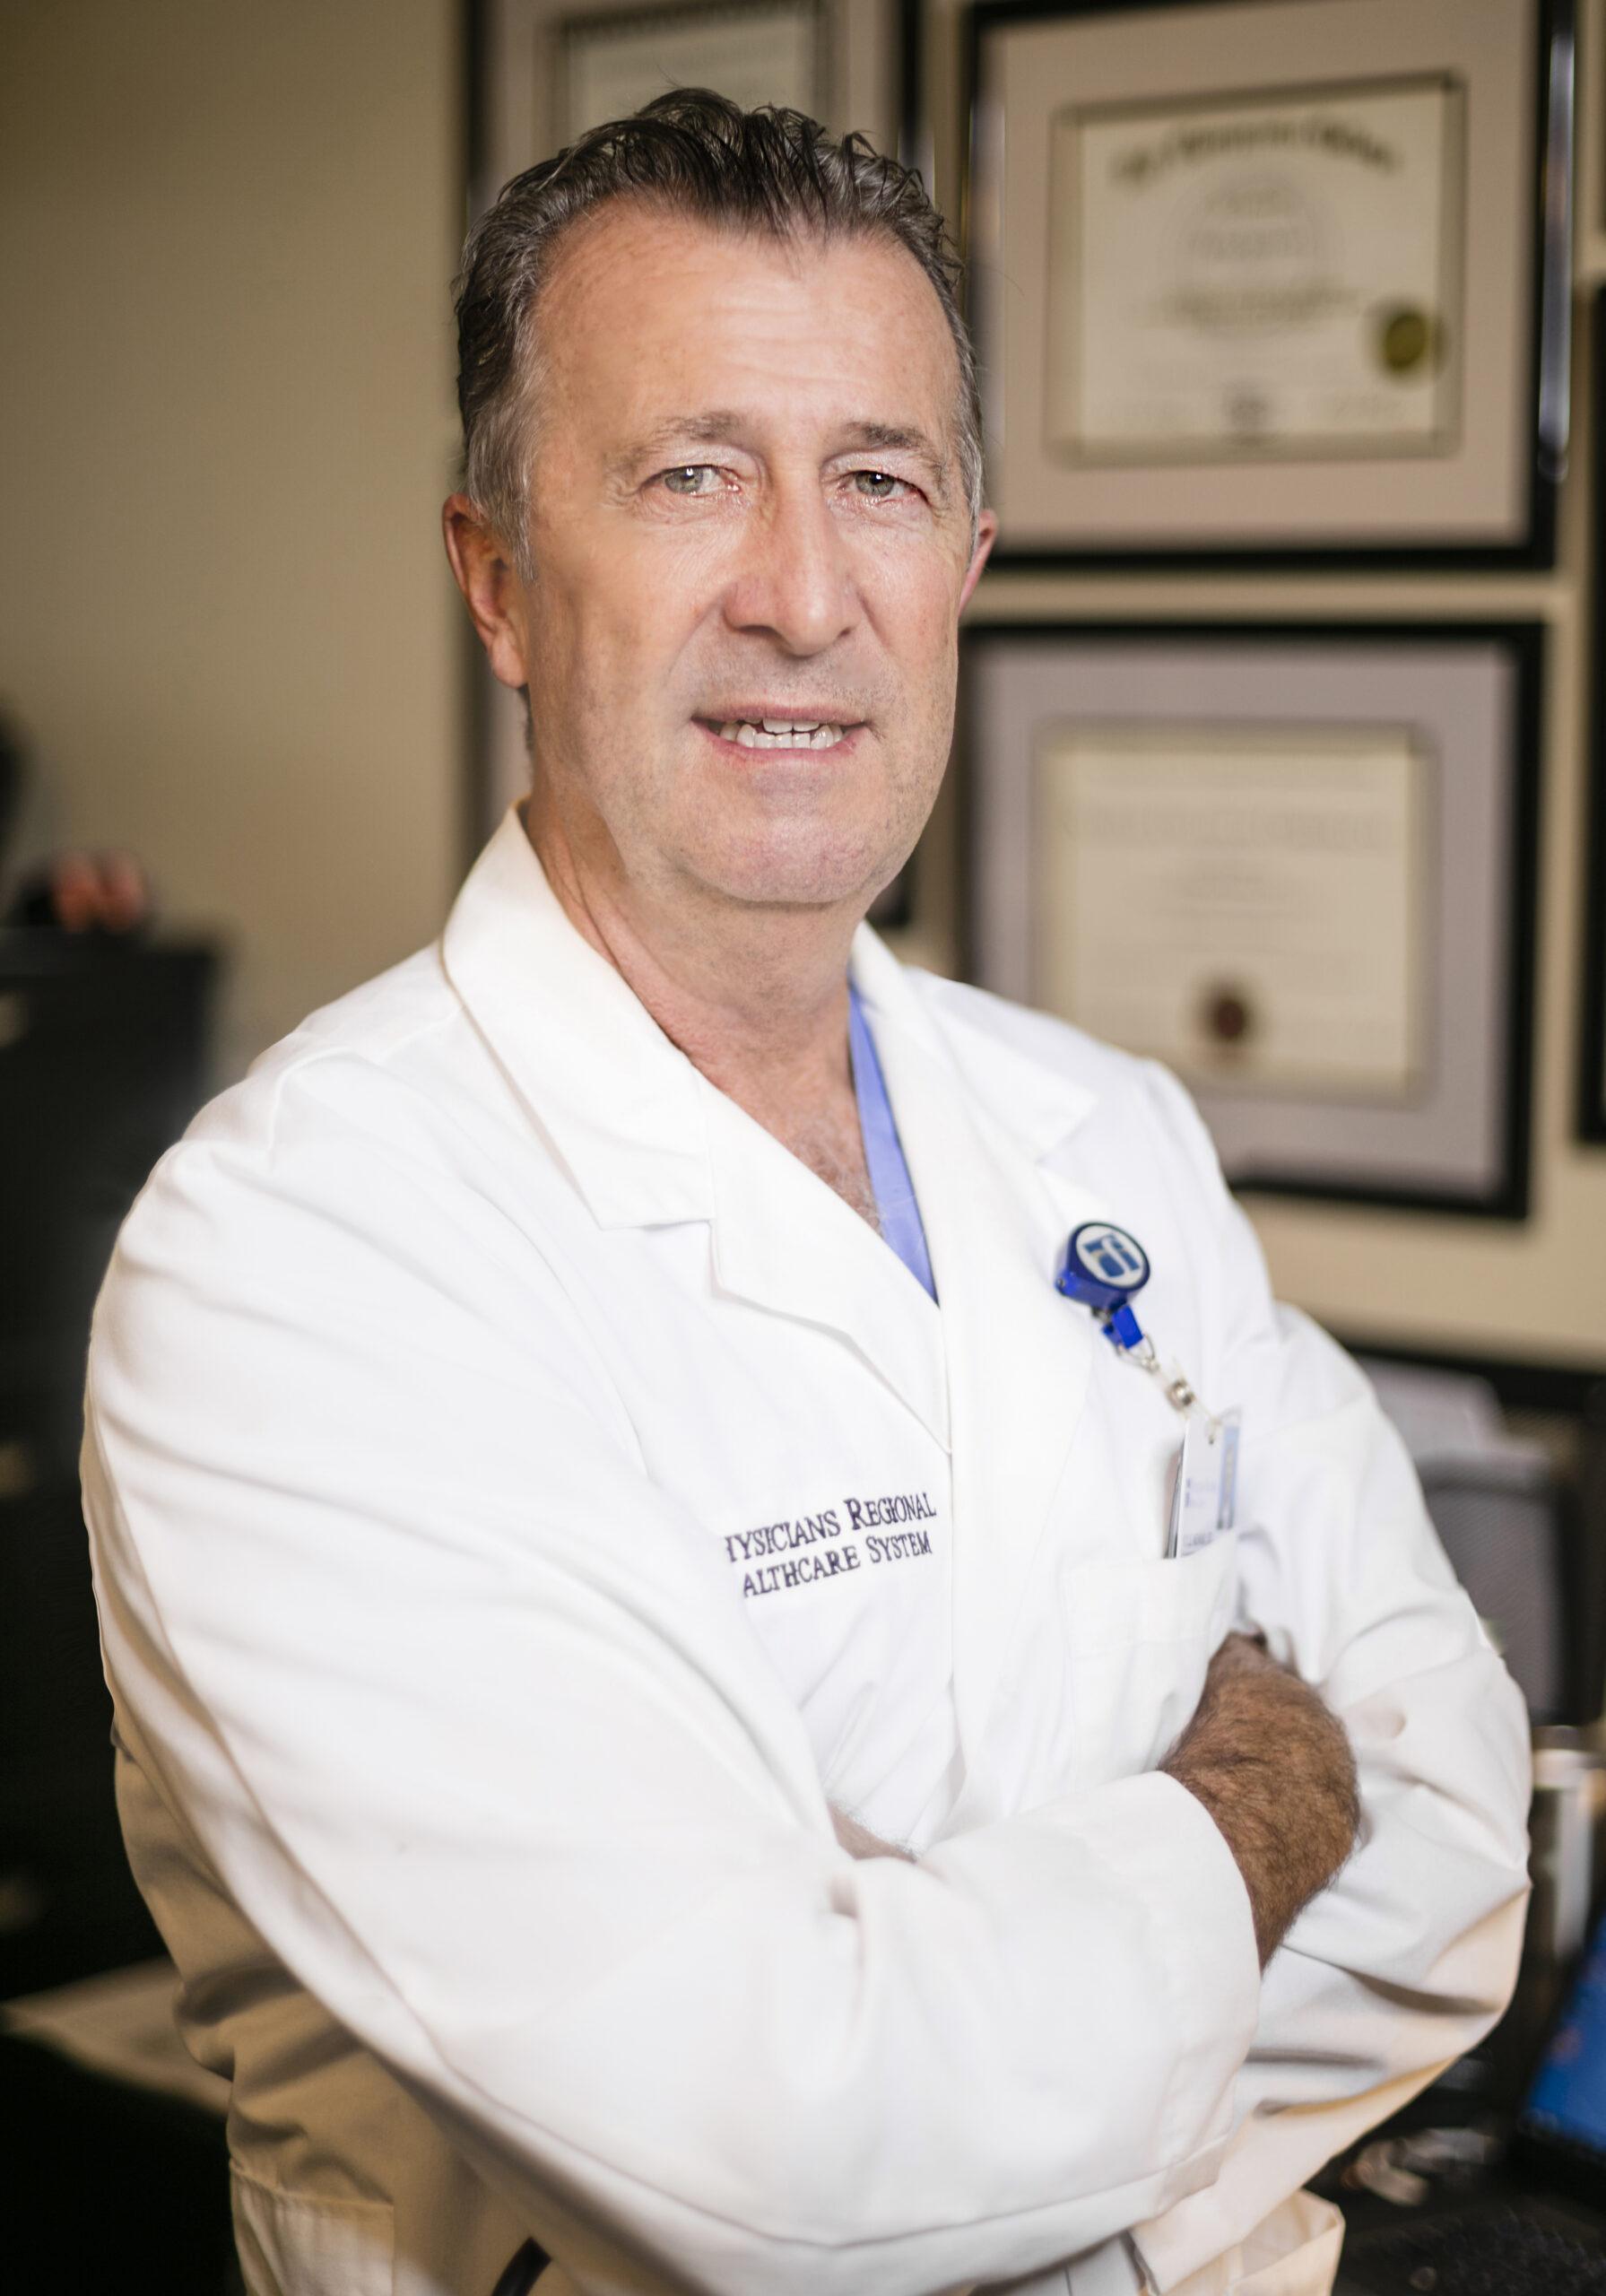 Dr. Kyle Nevius